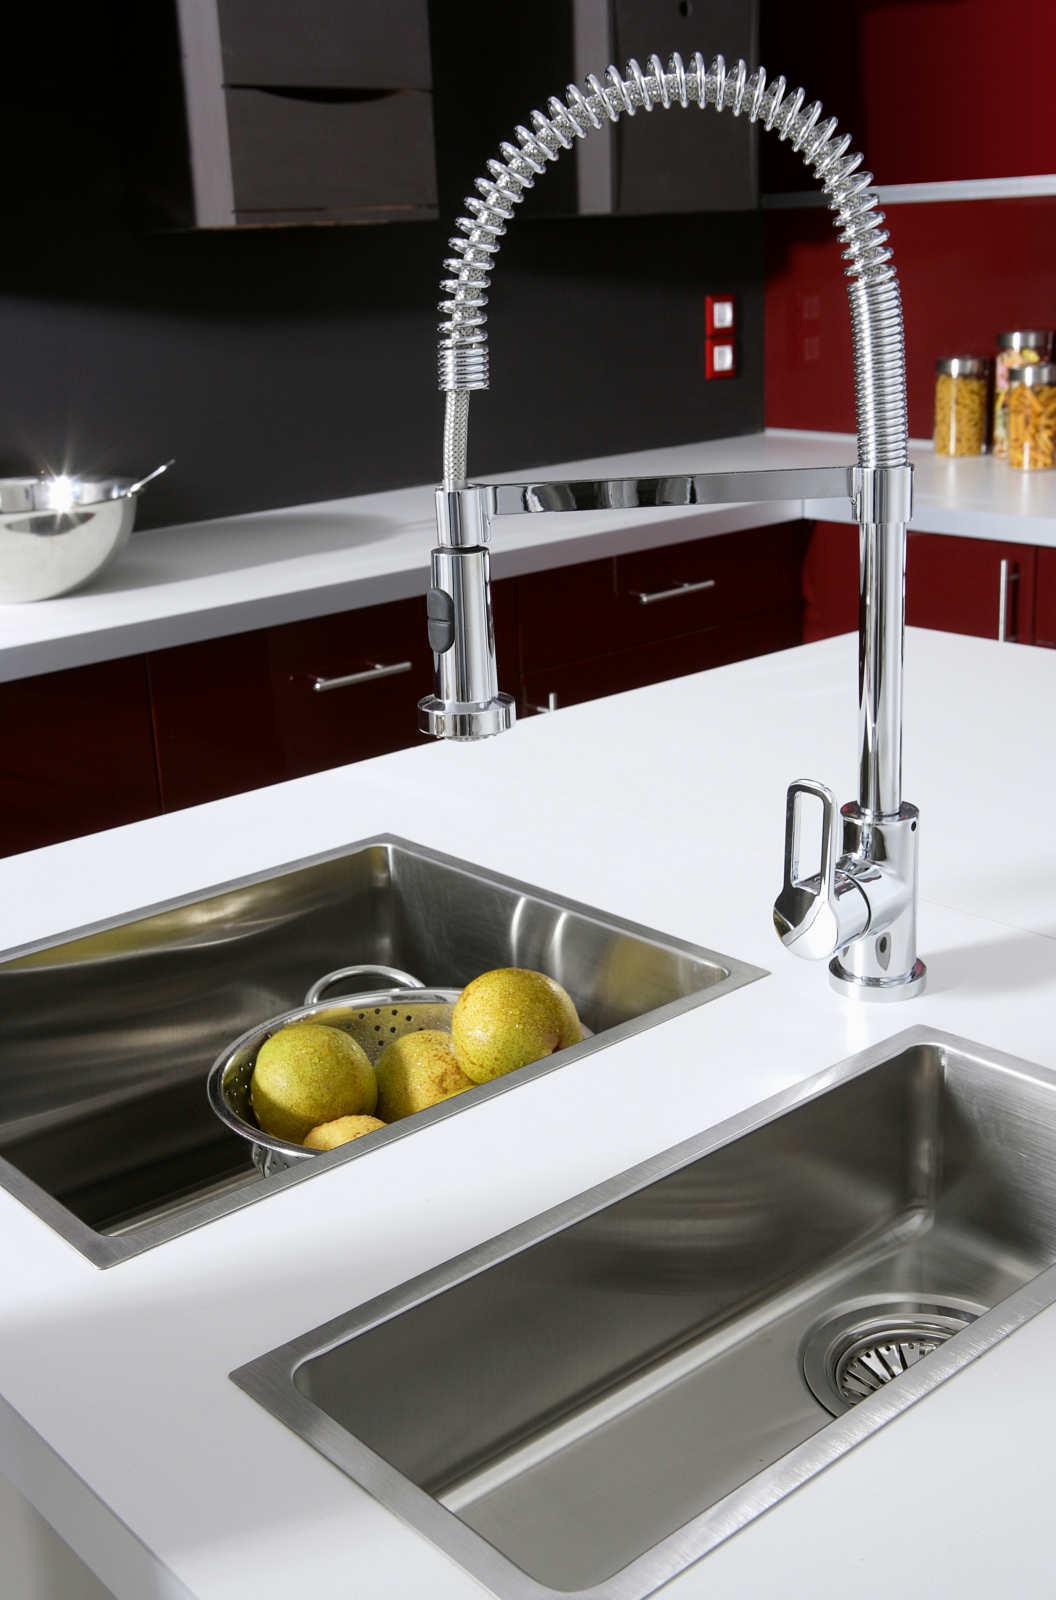 evier inox leroy merlin beautiful evier inox leroy merlin. Black Bedroom Furniture Sets. Home Design Ideas